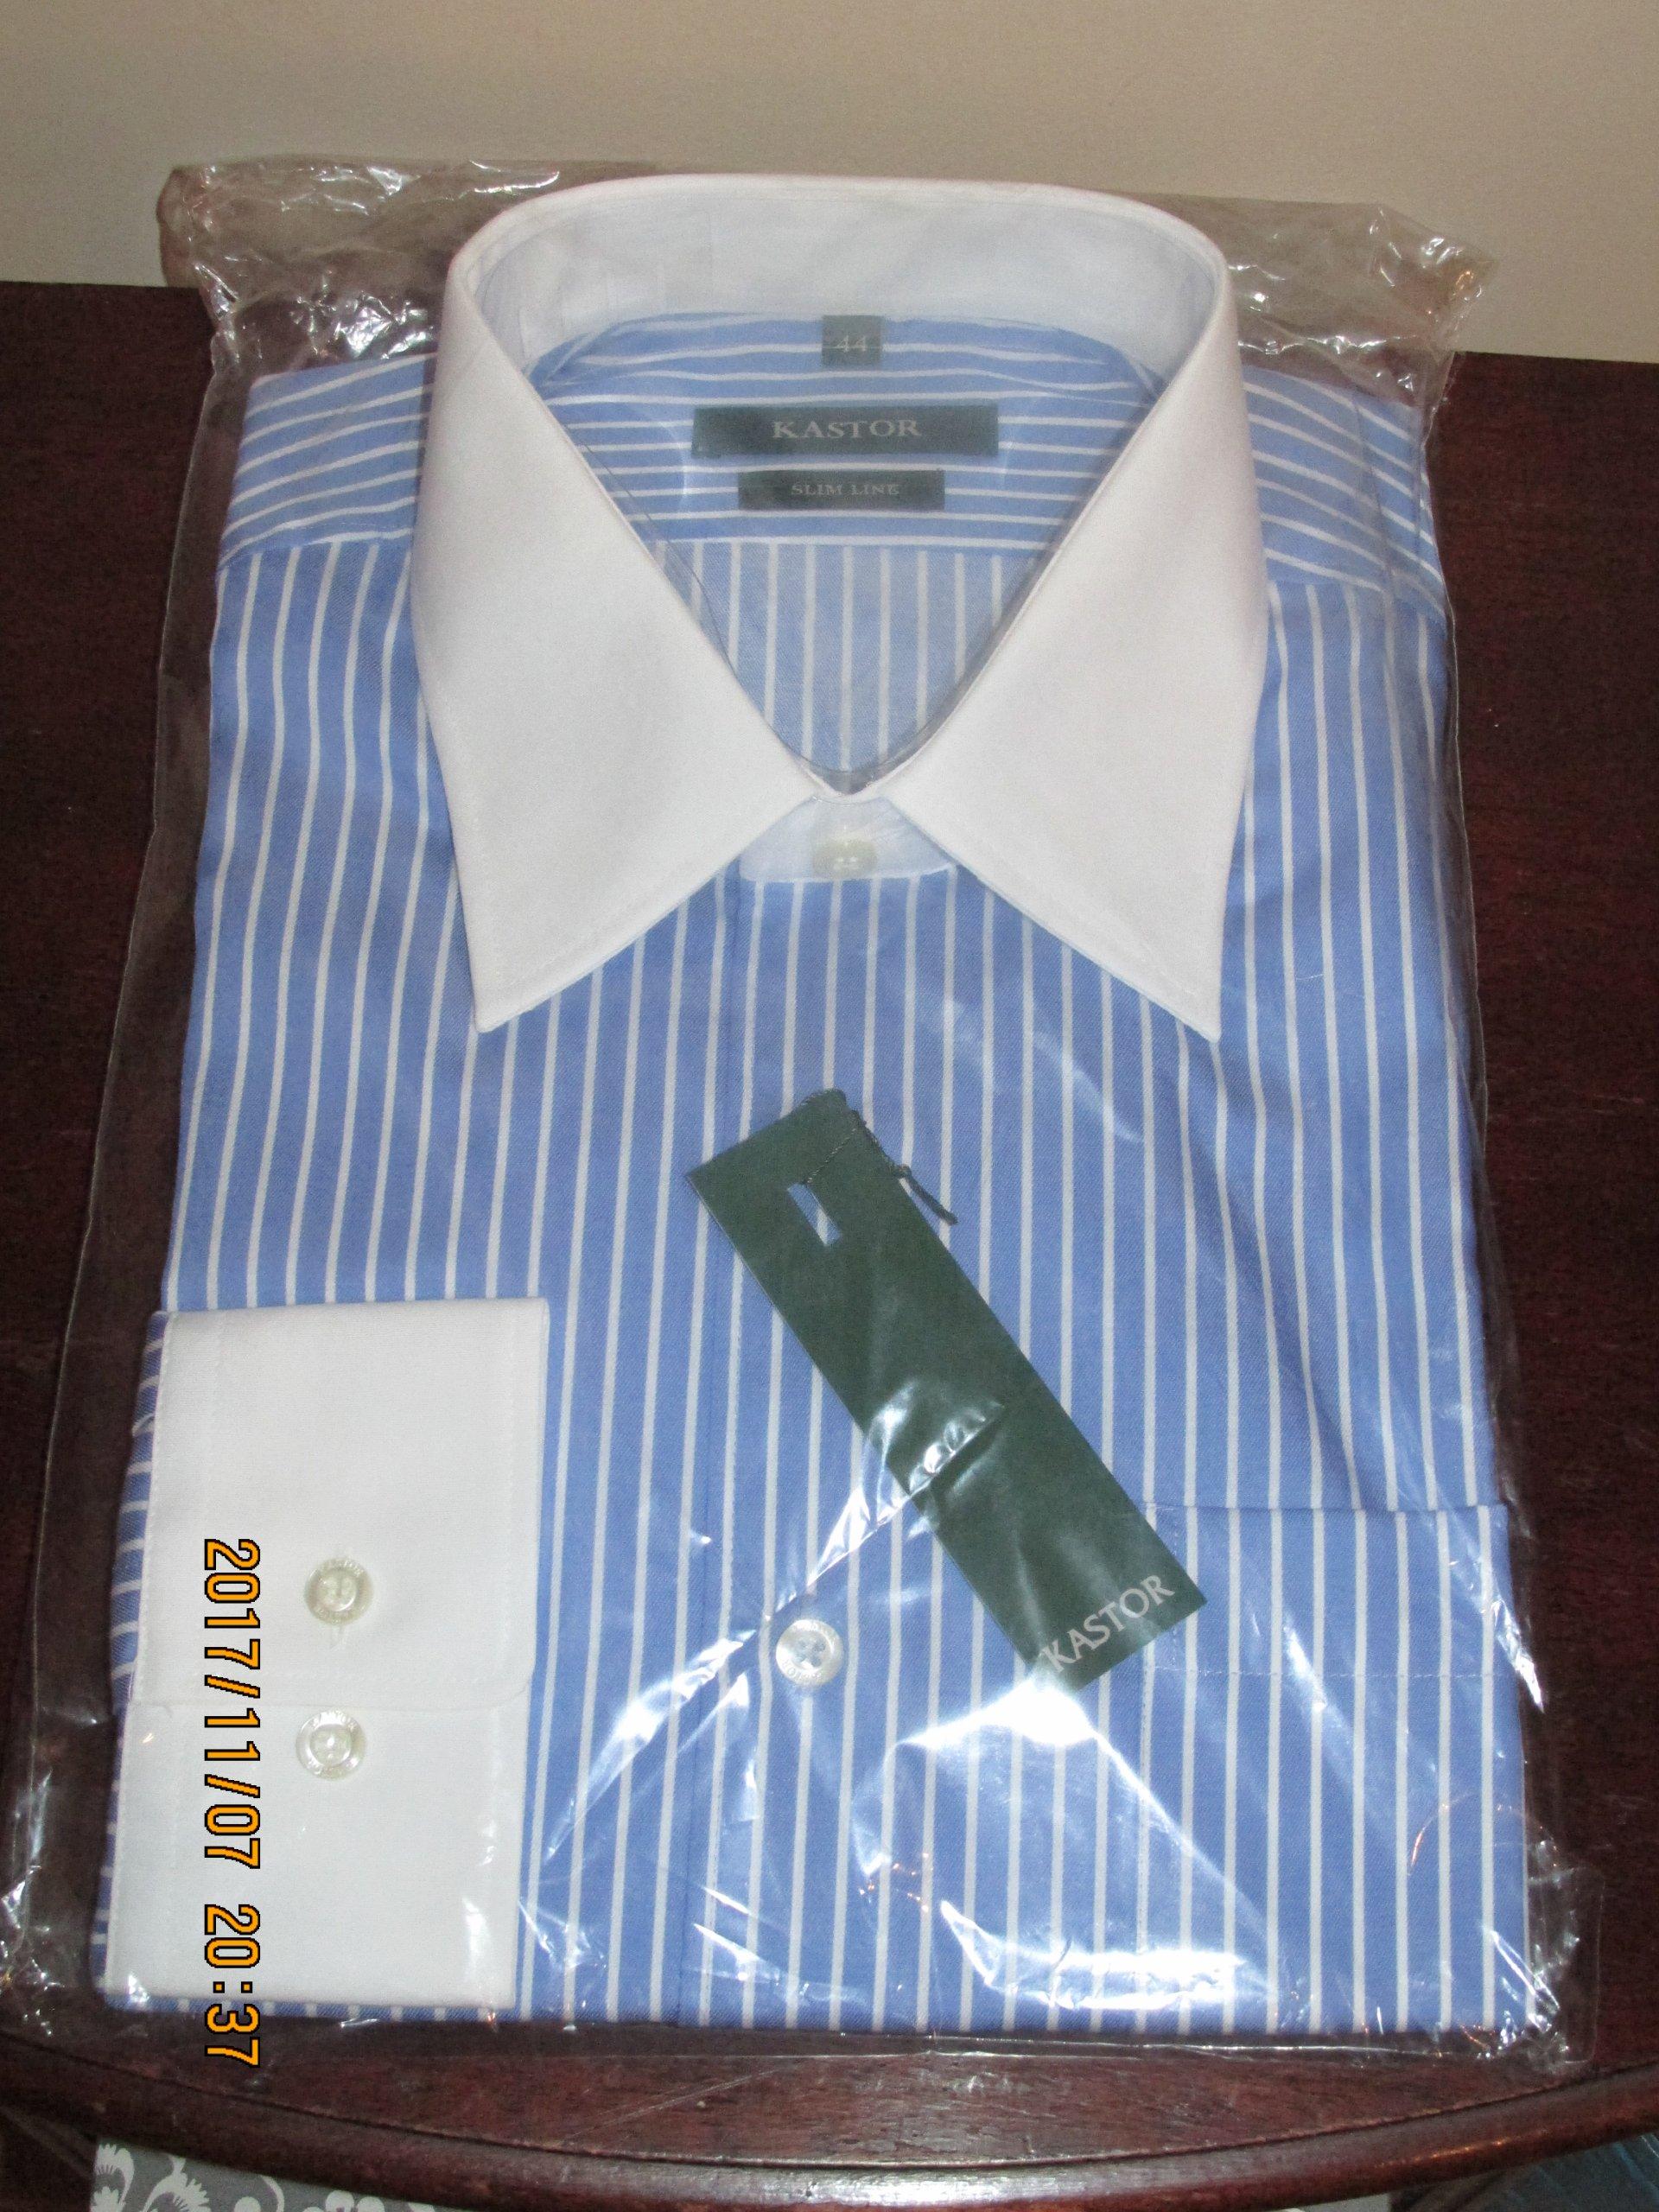 41b367bdb56e6a Koszula męska KASTOR w.176/183 r.44 SLIM - 7036227645 - oficjalne ...